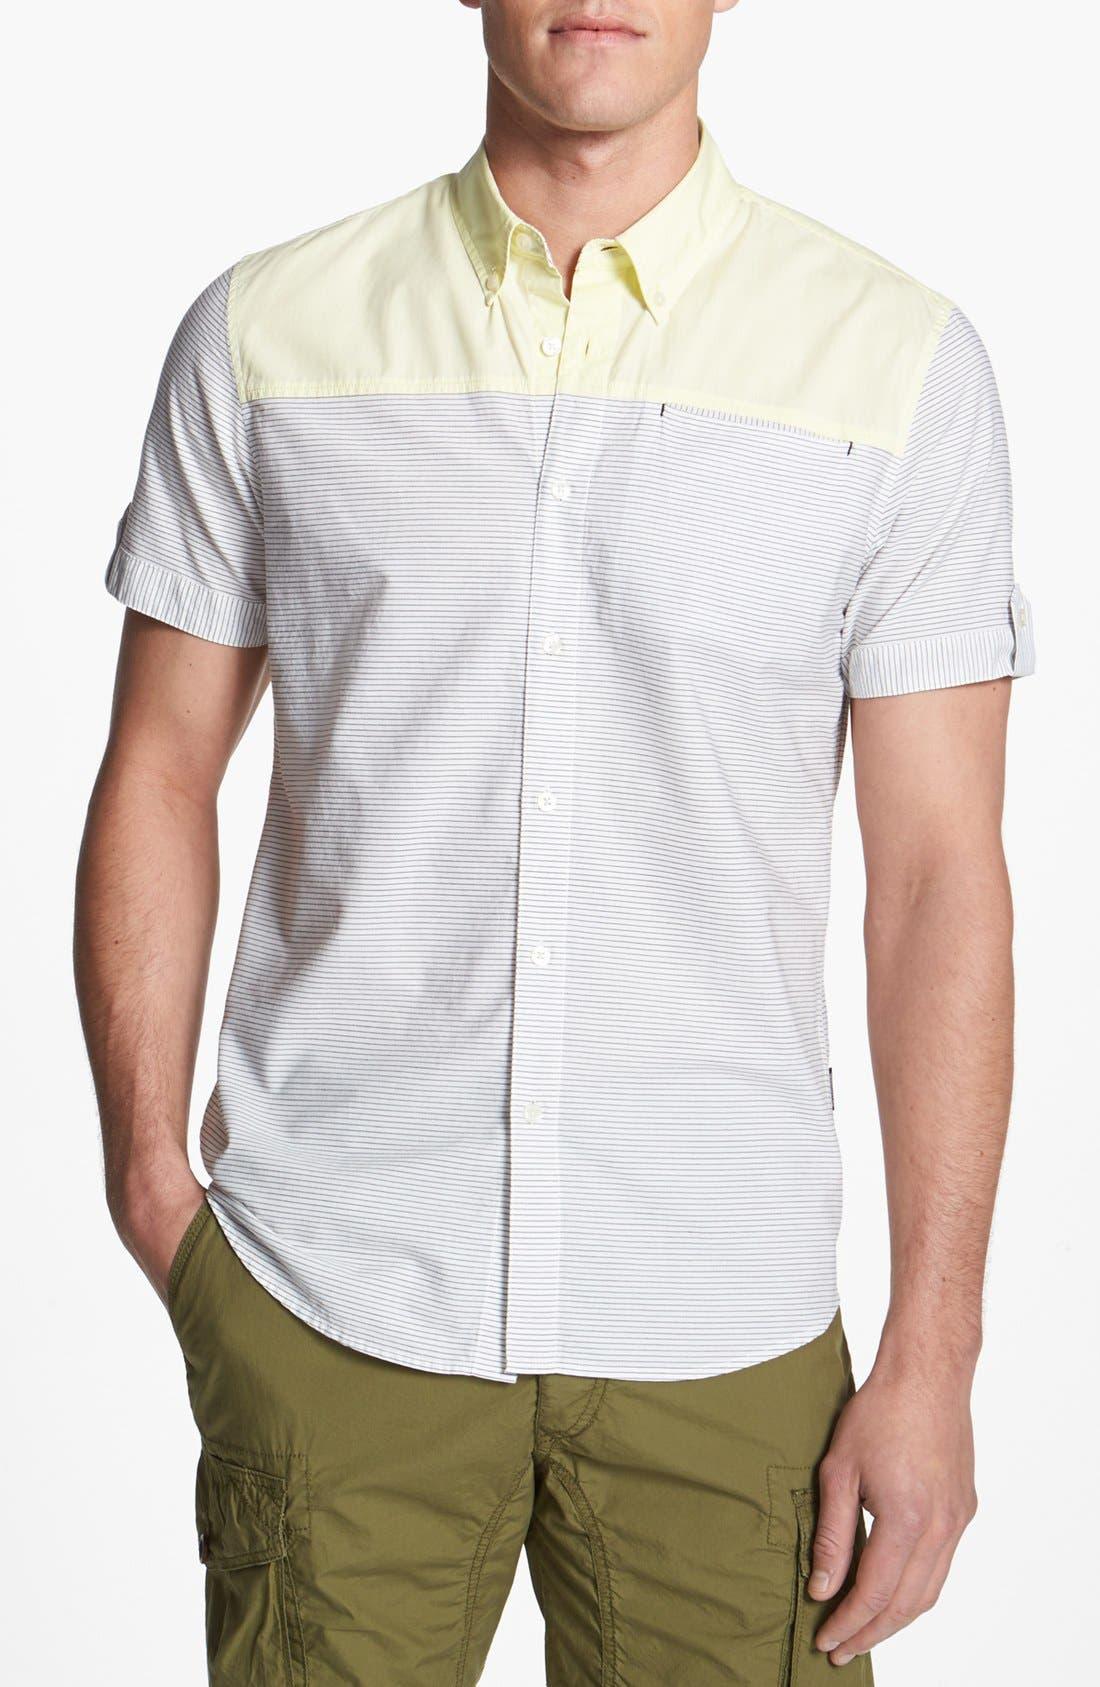 Alternate Image 1 Selected - 55DSL 'Sopelanacut' Woven Shirt